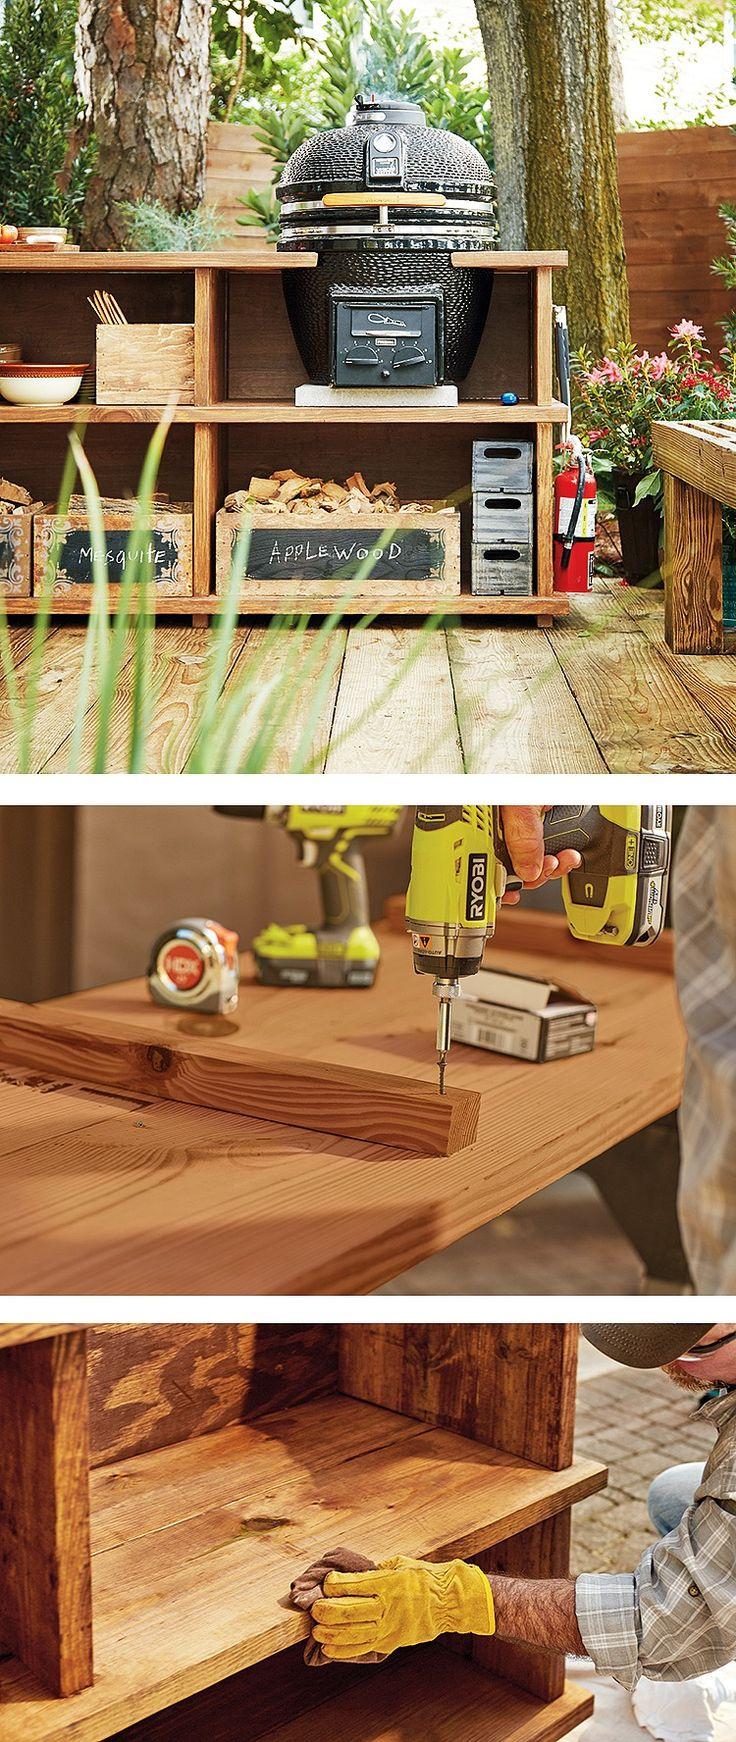 Best 25+ Grill station ideas on Pinterest | Patio ideas ... on Patio Grill Station id=91173